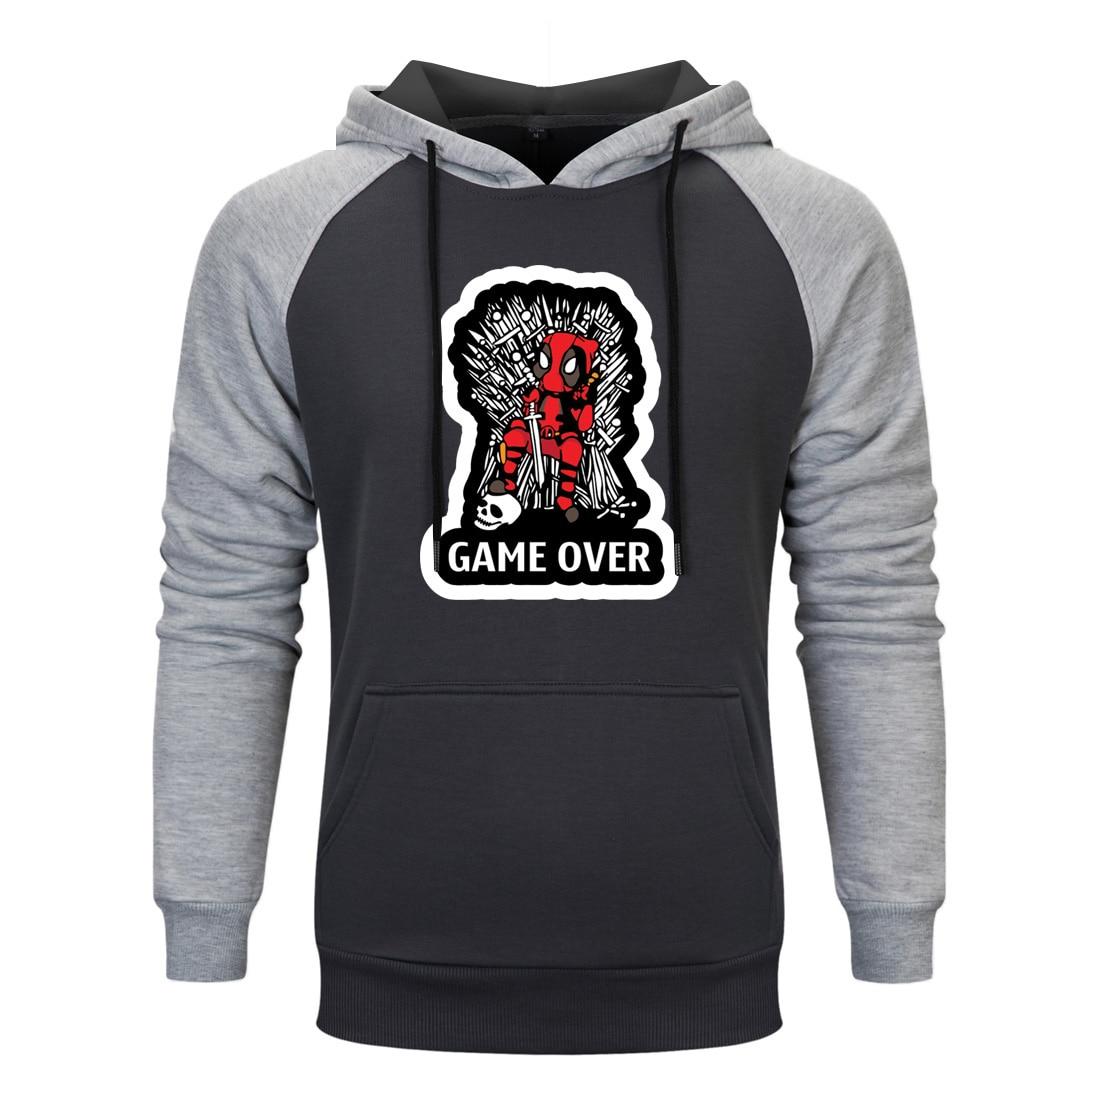 Men Deadpool Print Hoodies Sweatshirts Fashion Autumn Winter Harajuku Tracksuits Pullovers Fleece Streetwear Hoody Clothes 2019